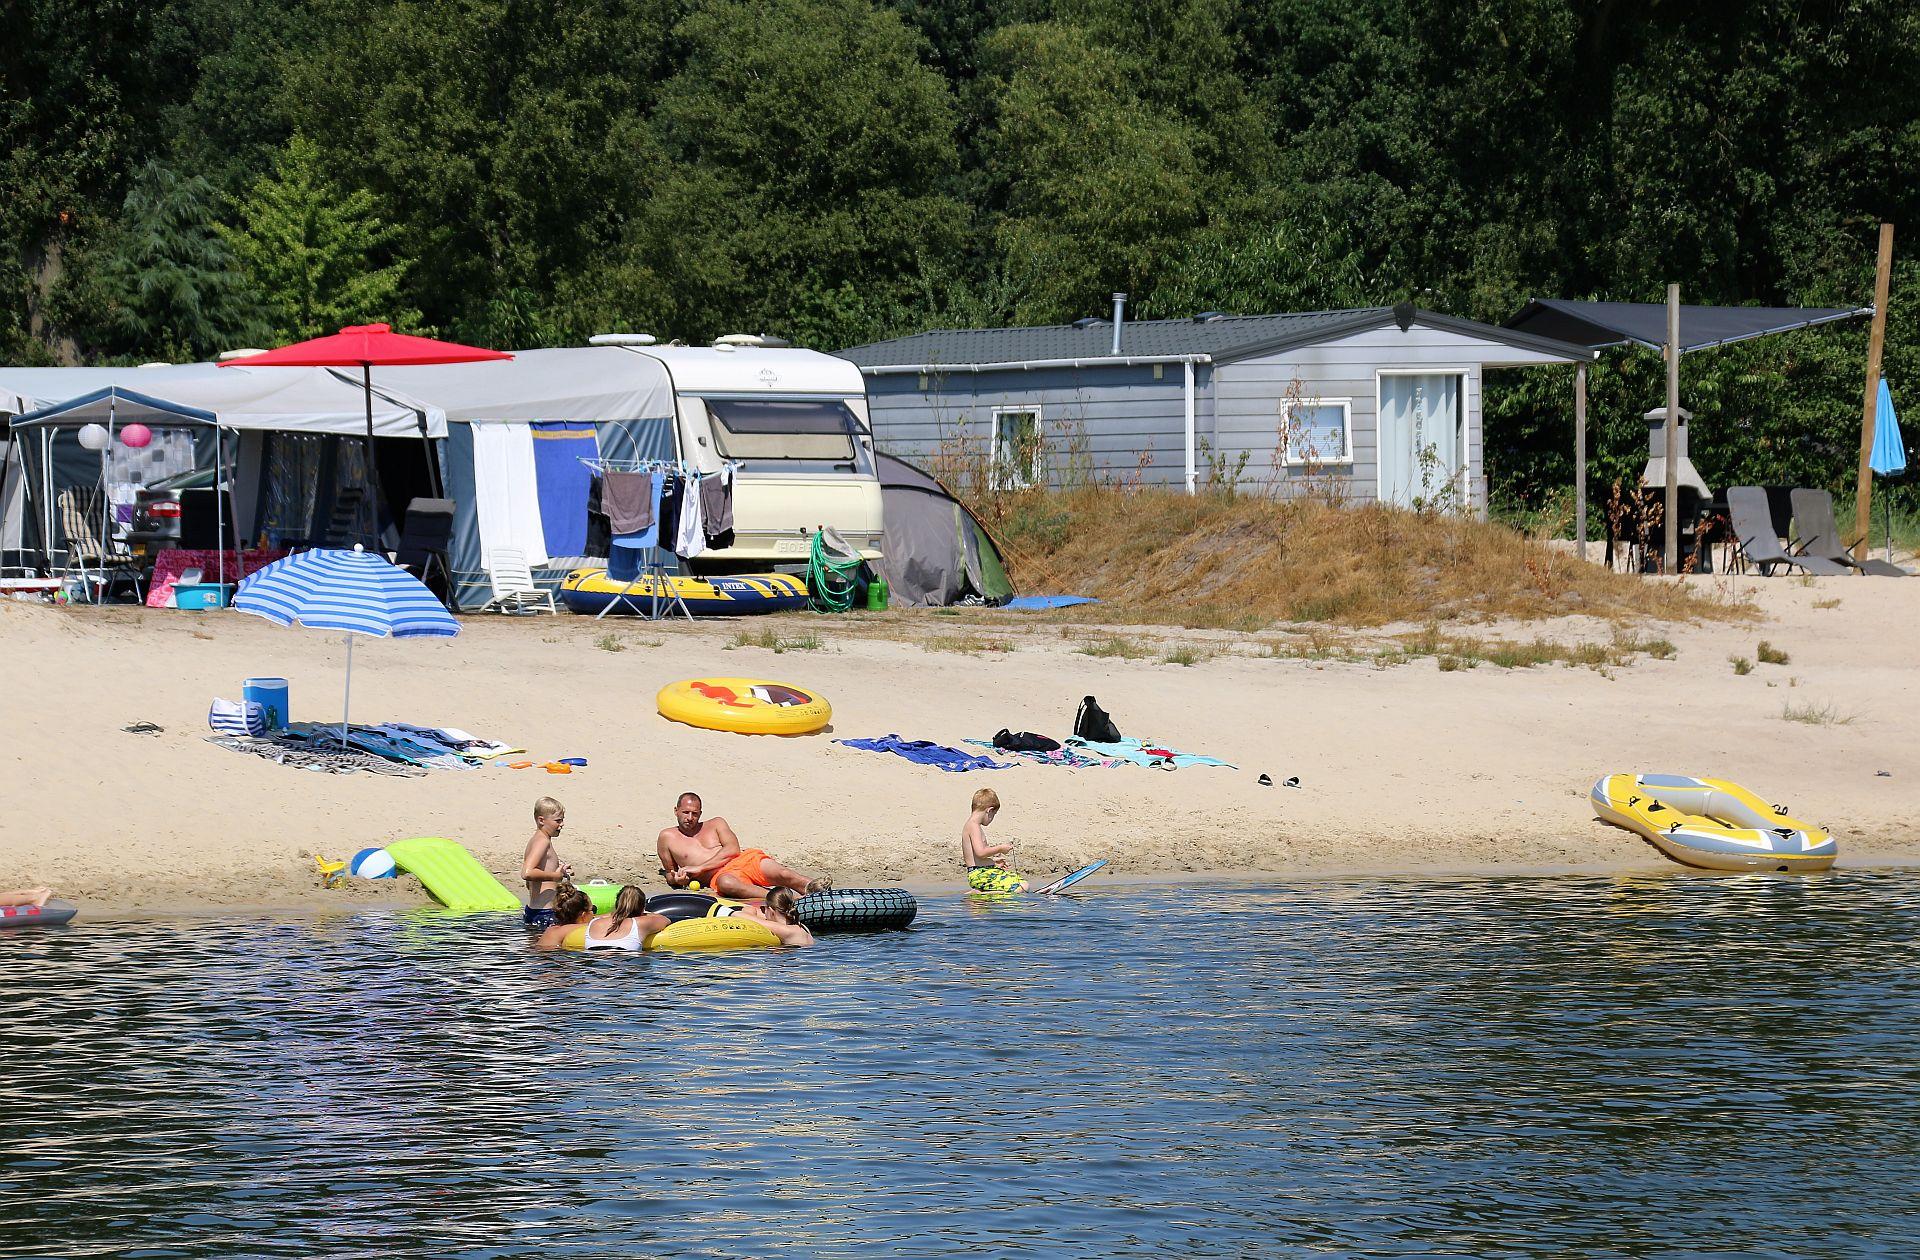 Kamperen op gezinscamping in Hardenberg - kamperen op gezinscamping in Hardenberg